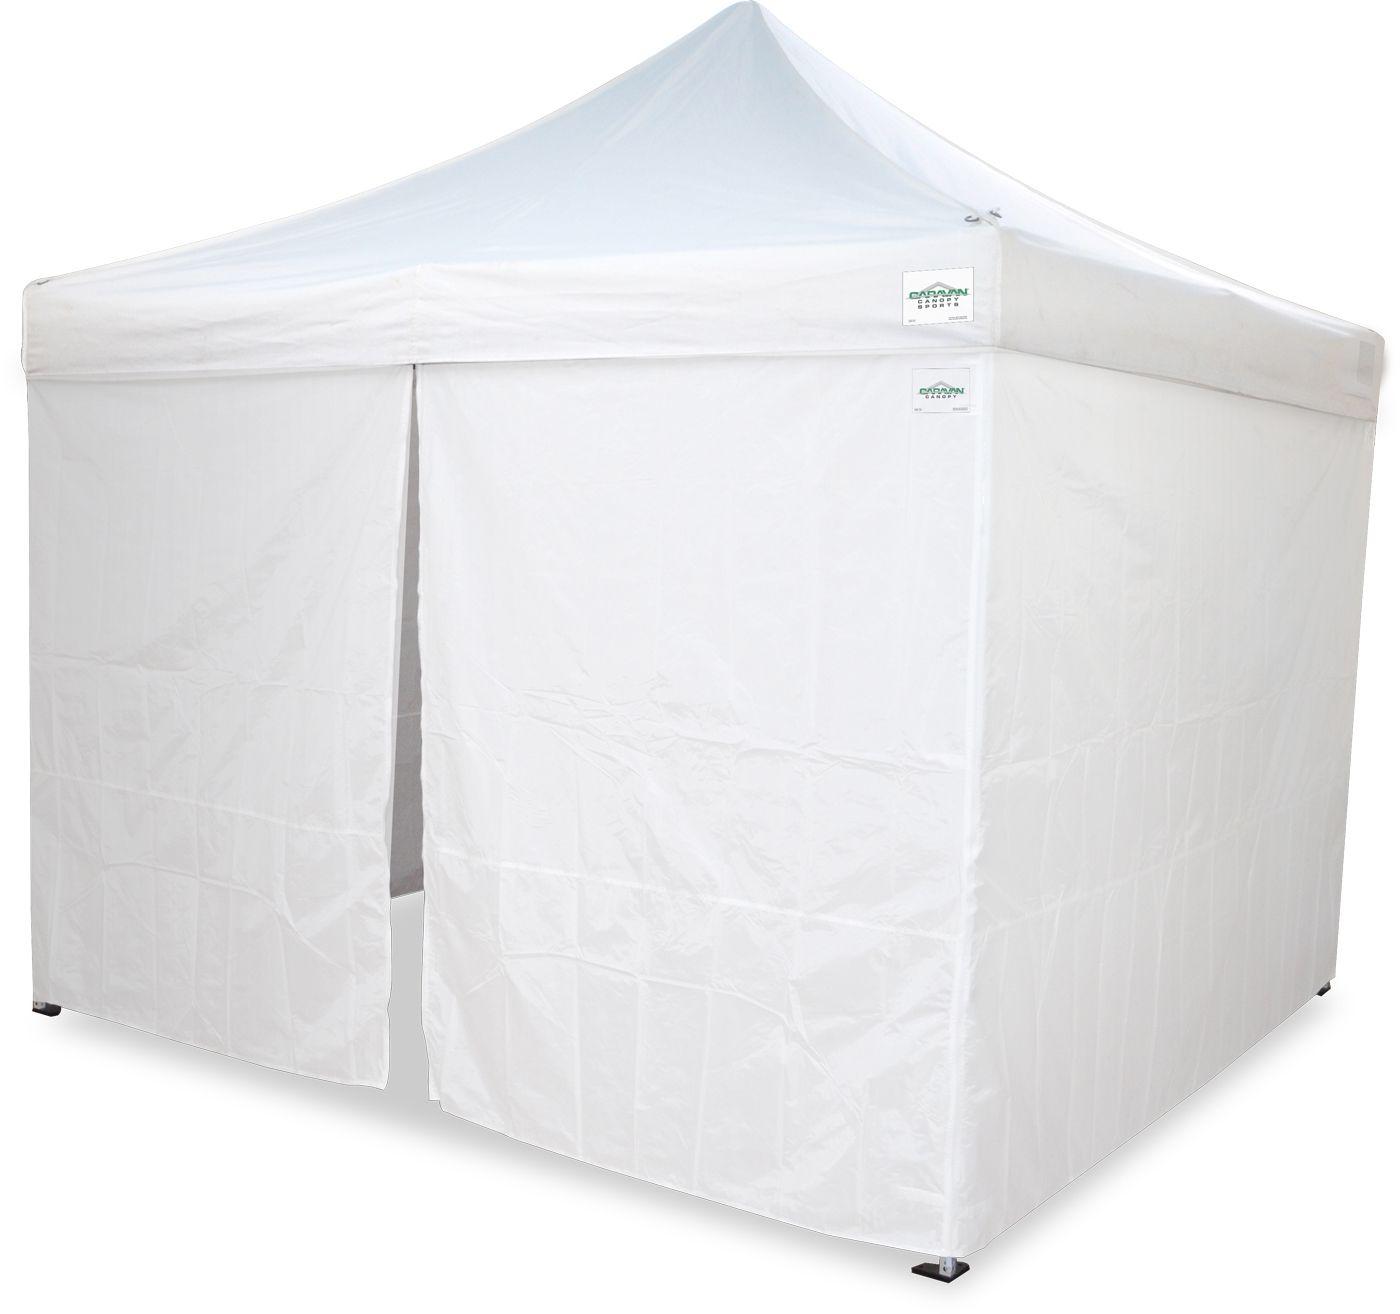 Caravan Canopy 10u0027 x 10u0027 Straight Leg Canopy Sidewalls  sc 1 st  DICKu0027S Sporting Goods & Caravan Canopy 10u0027 x 10u0027 Straight Leg Canopy Sidewalls | DICKu0027S ...